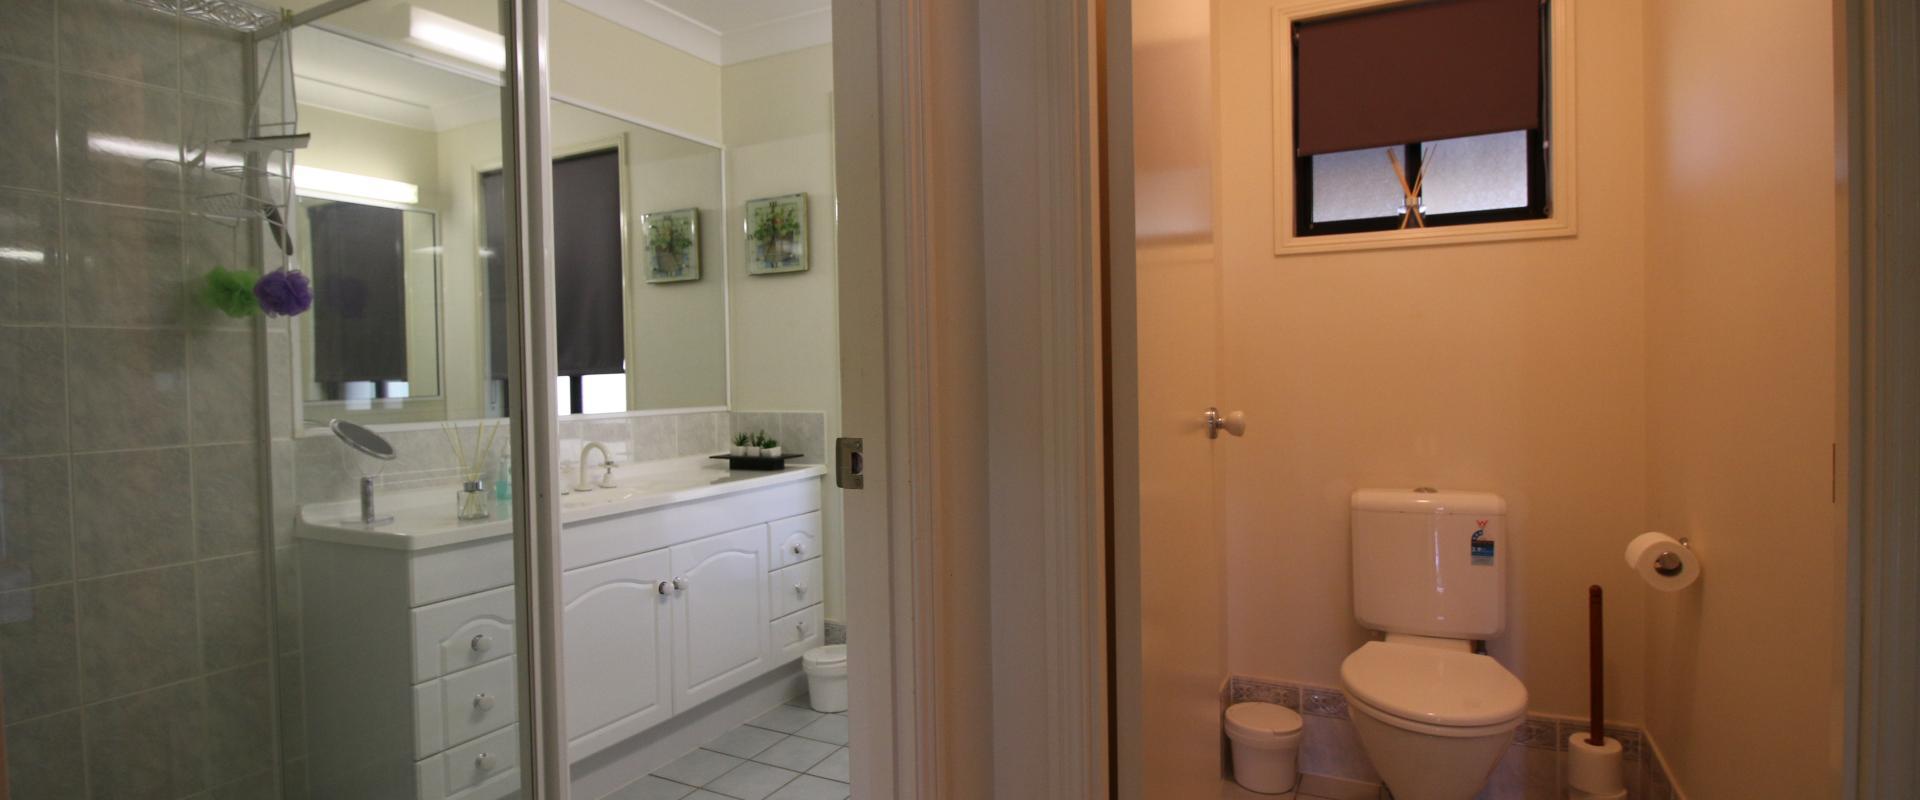 Main Bathroom & Toilet